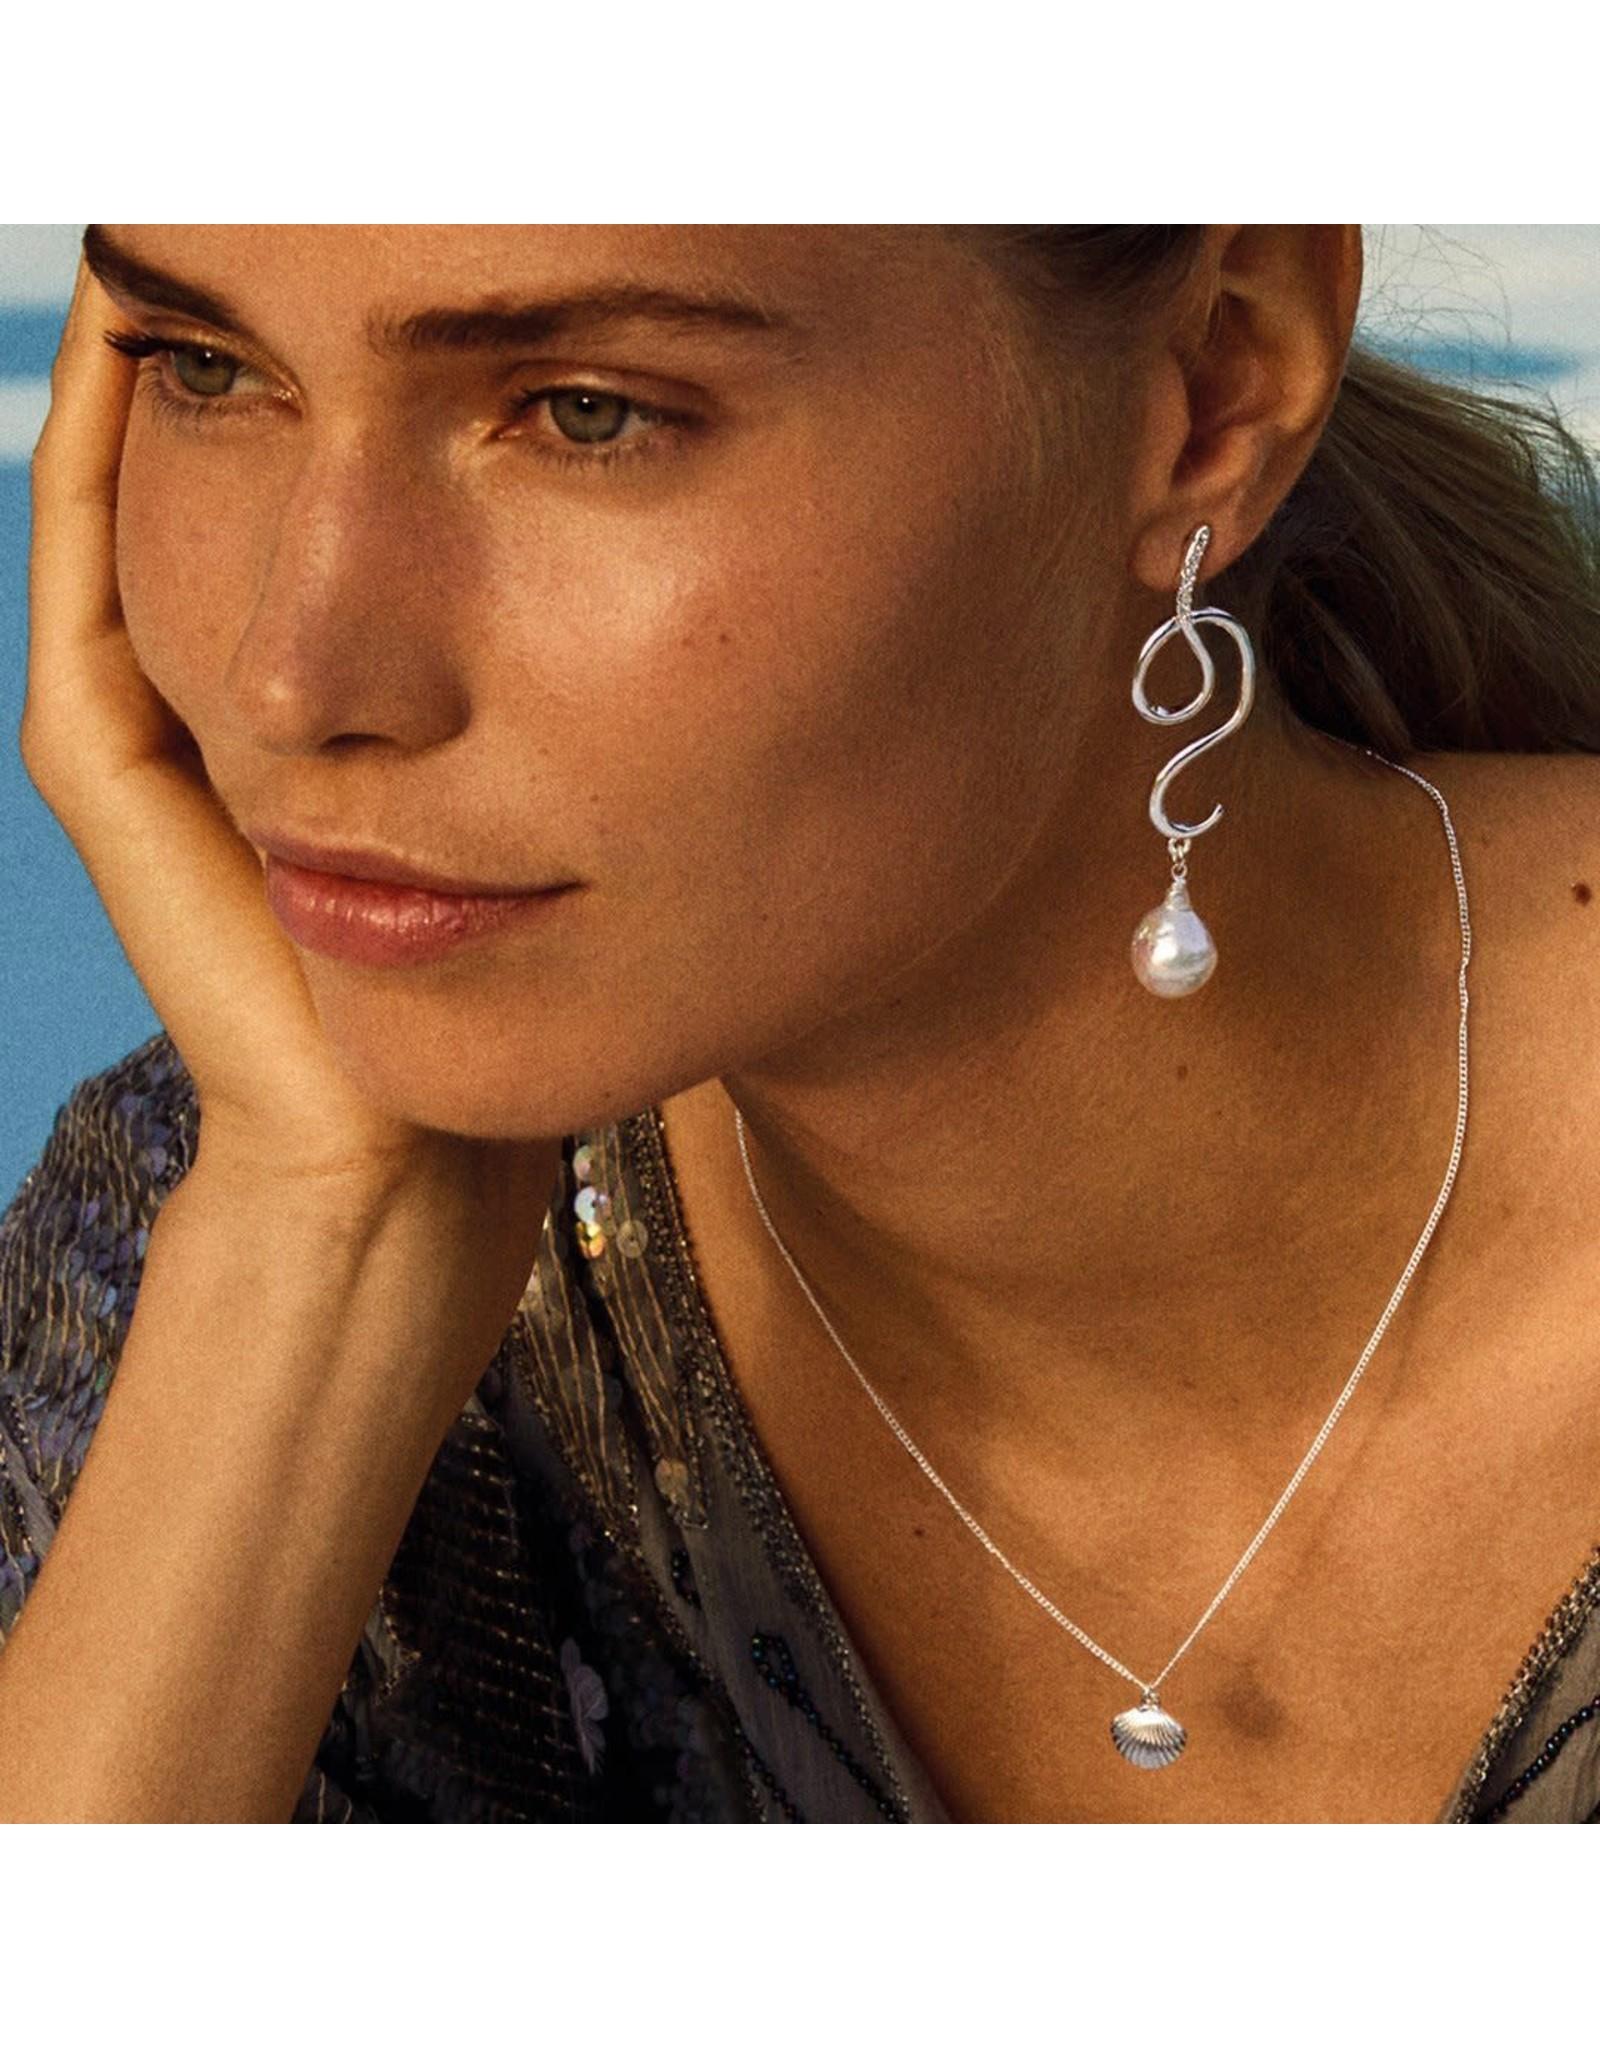 Pilgrim Pilgrim Love Necklace Silver Plated